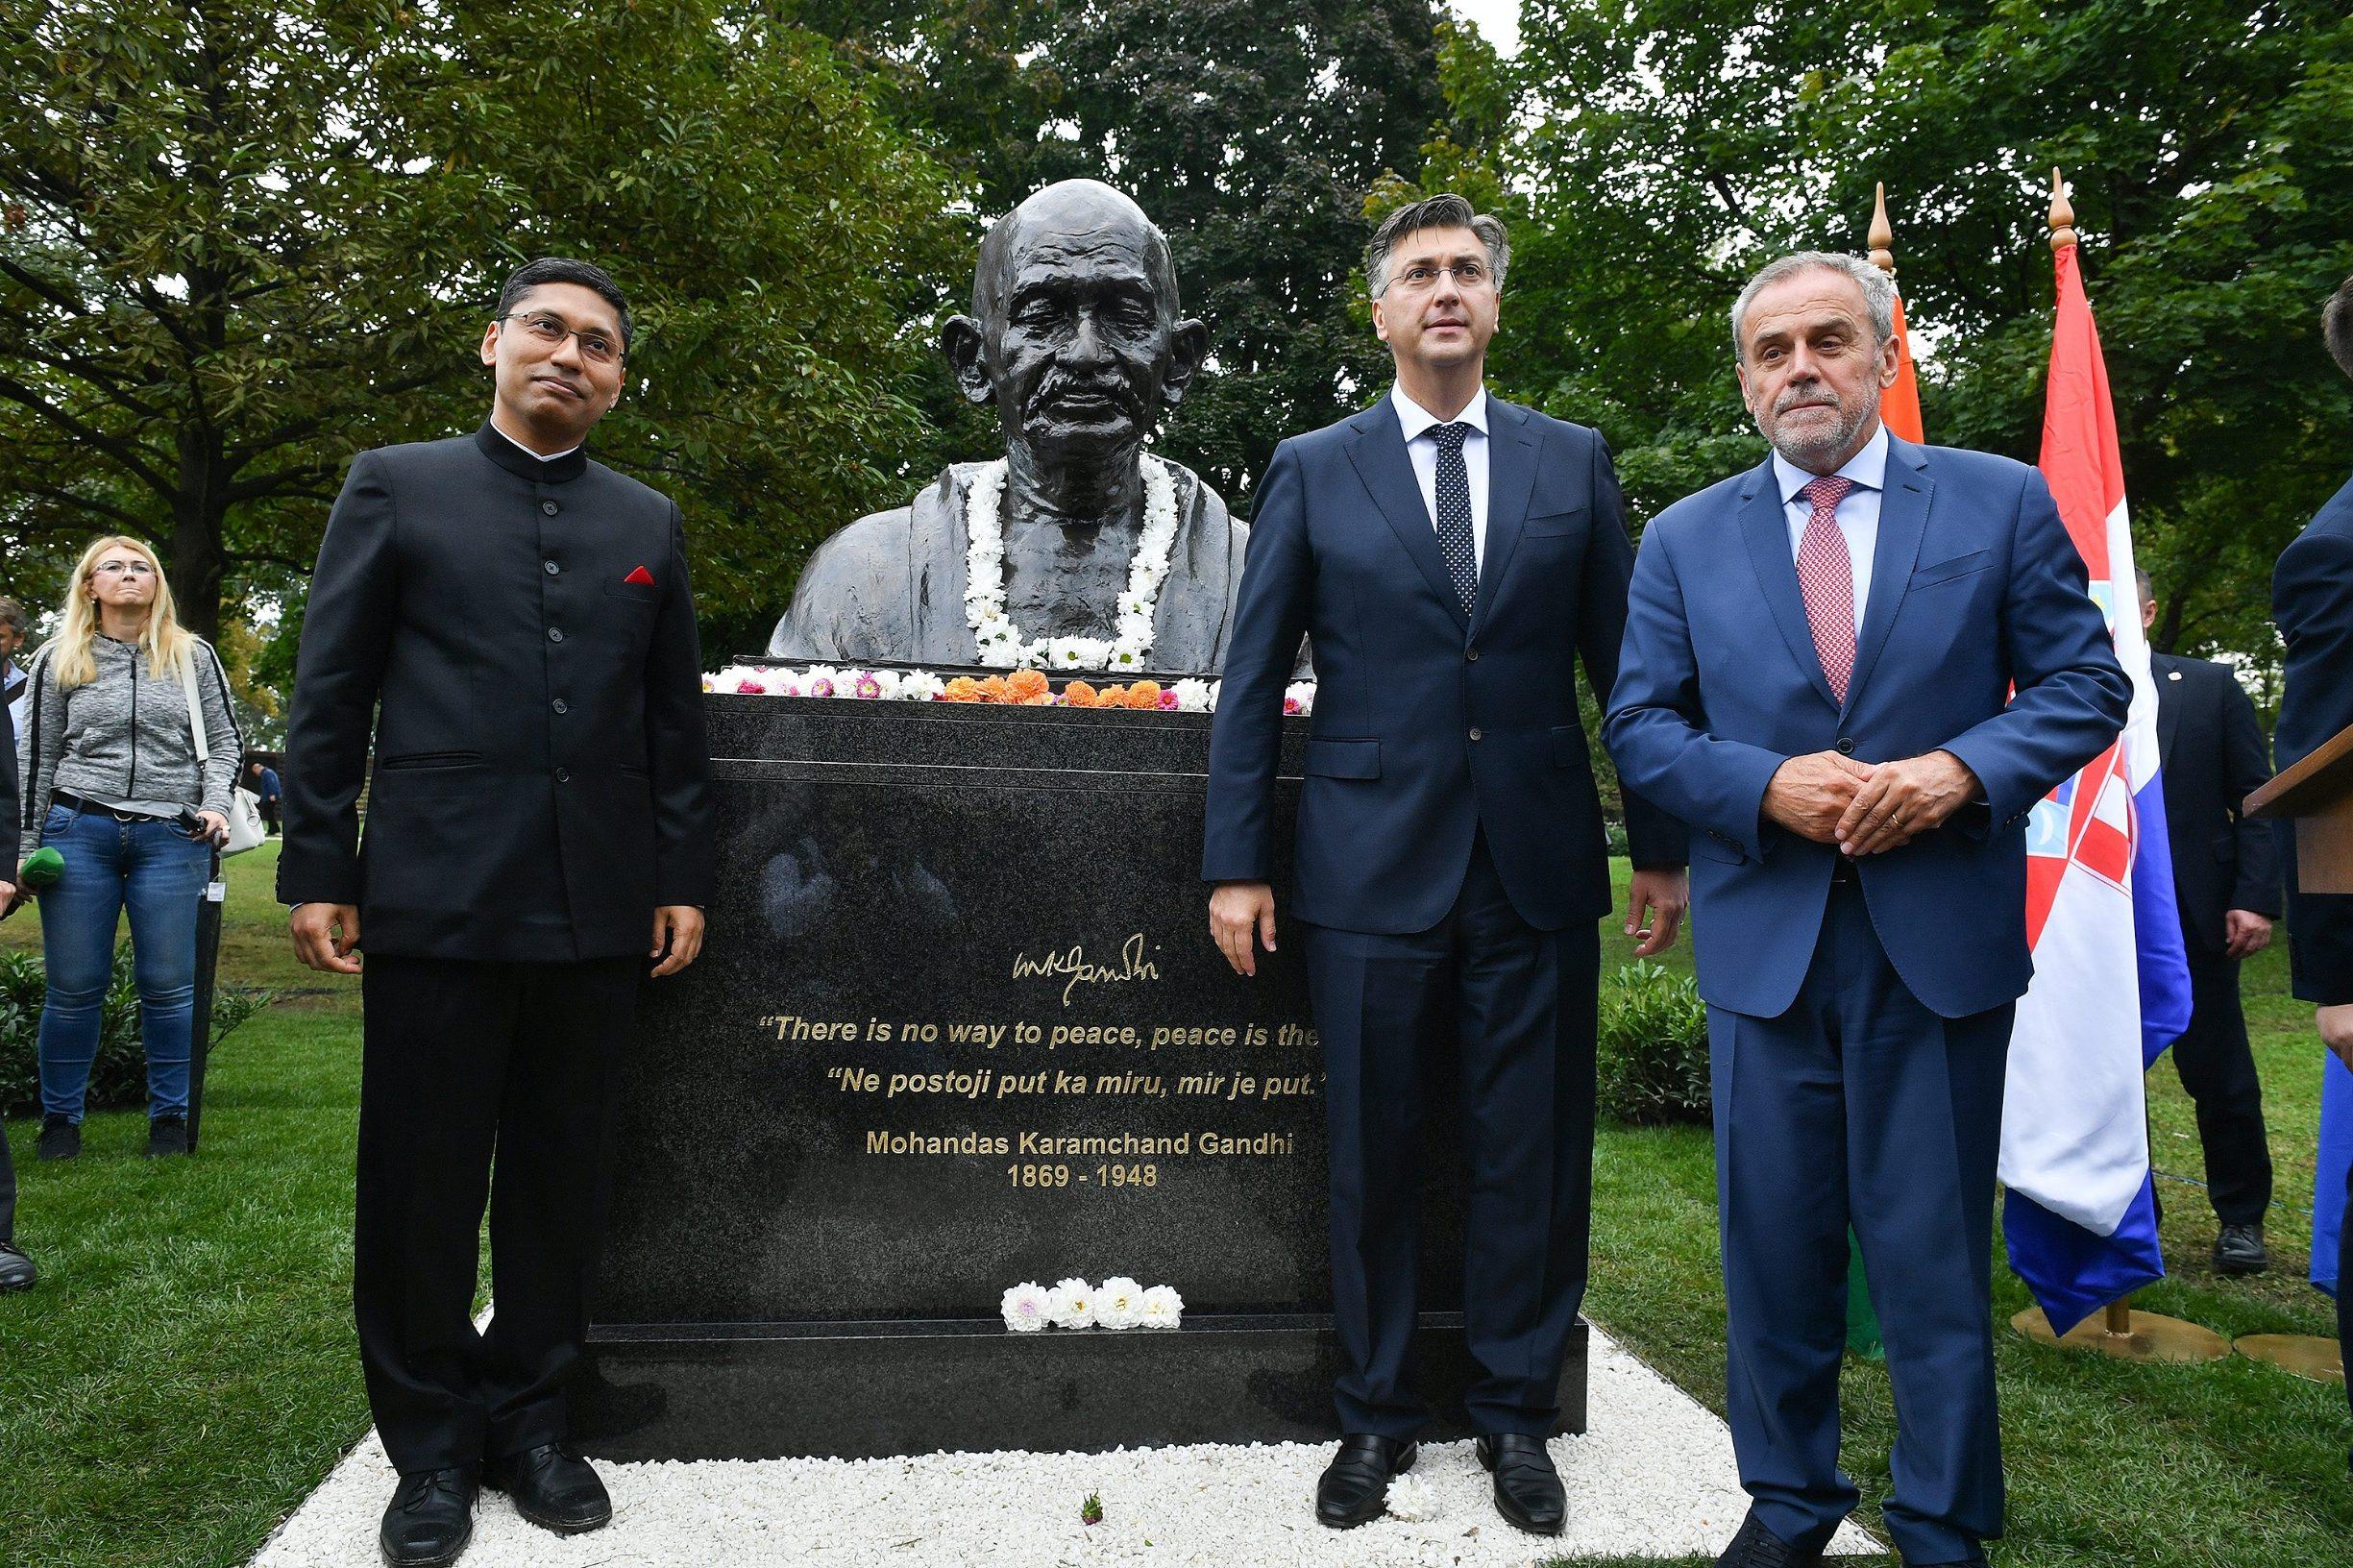 Na fotografiji: Arindam Bagchi veleposlanik Indije, Andrej Plenković i Milan Bandić